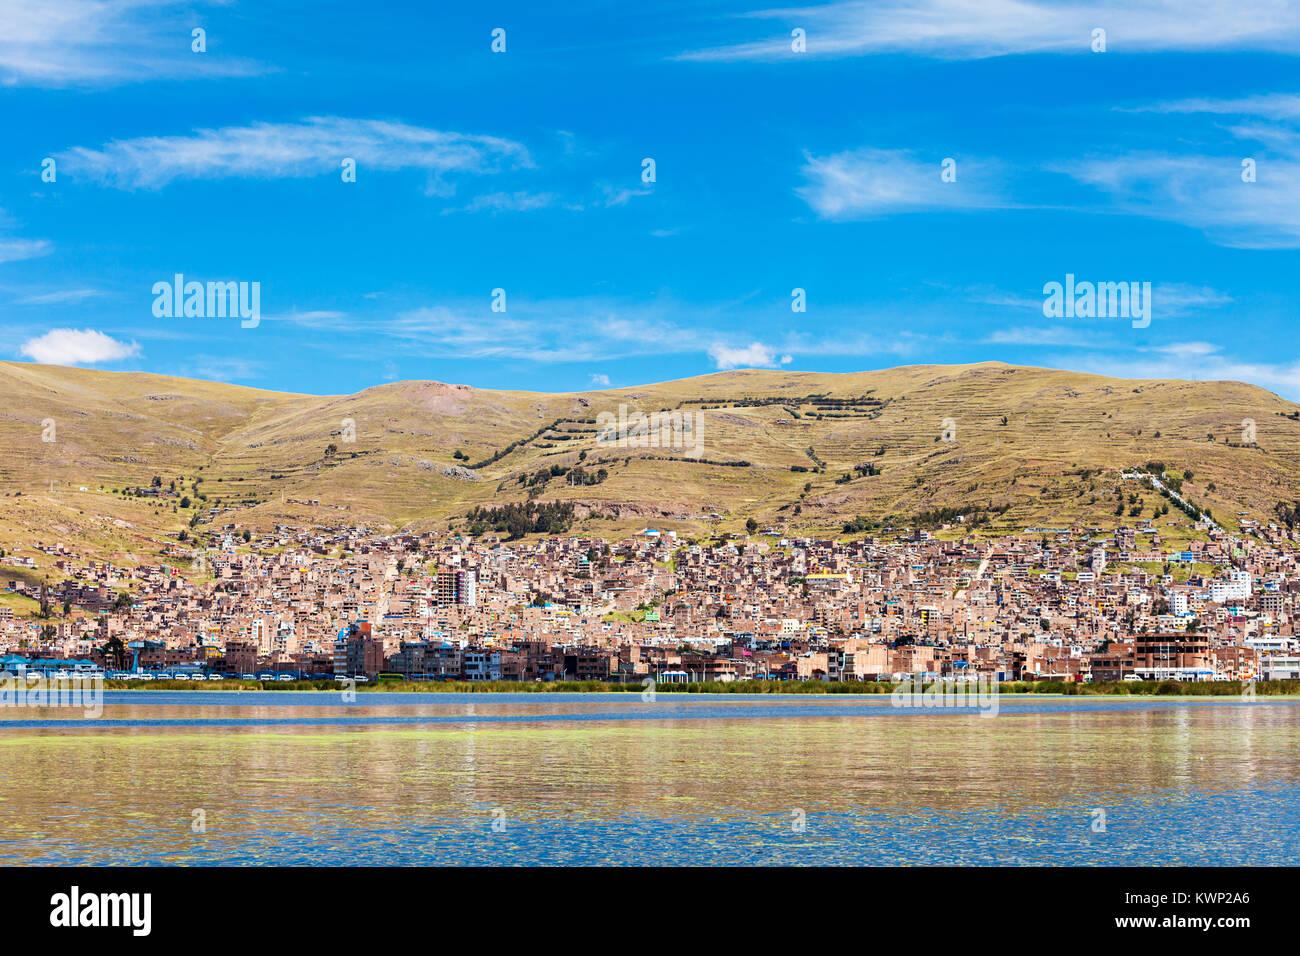 Puno panoramic view from Titicaca lake, Peru - Stock Image